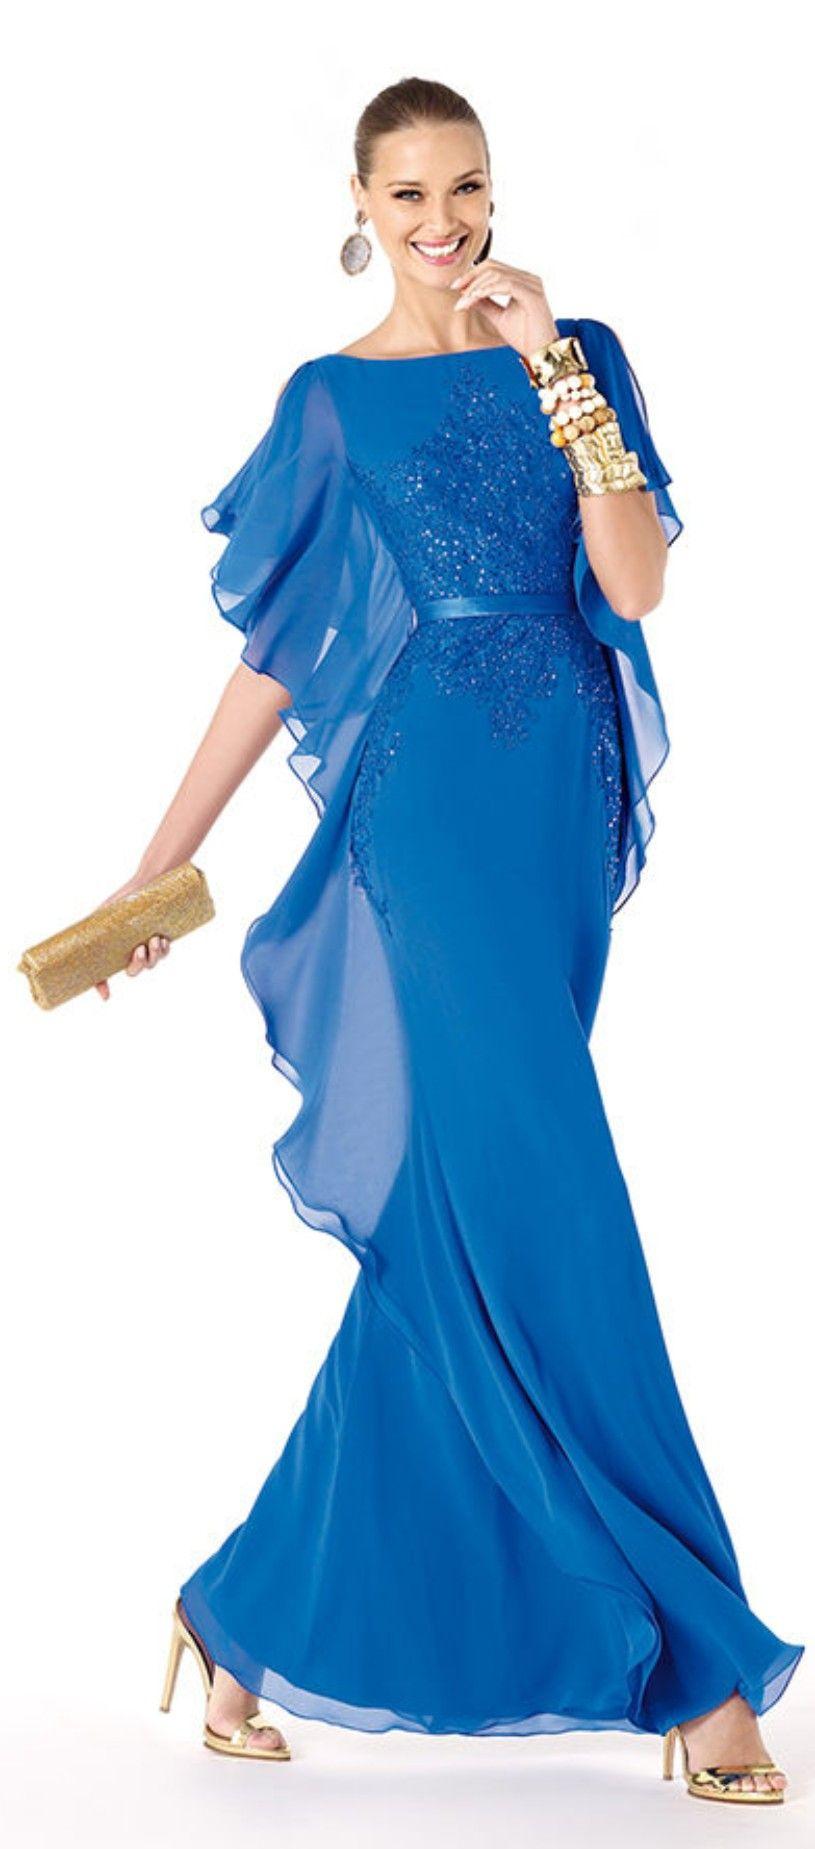 Pronovias 2014 | dresses | Pinterest | Vestidos de fiesta, Vestidos ...